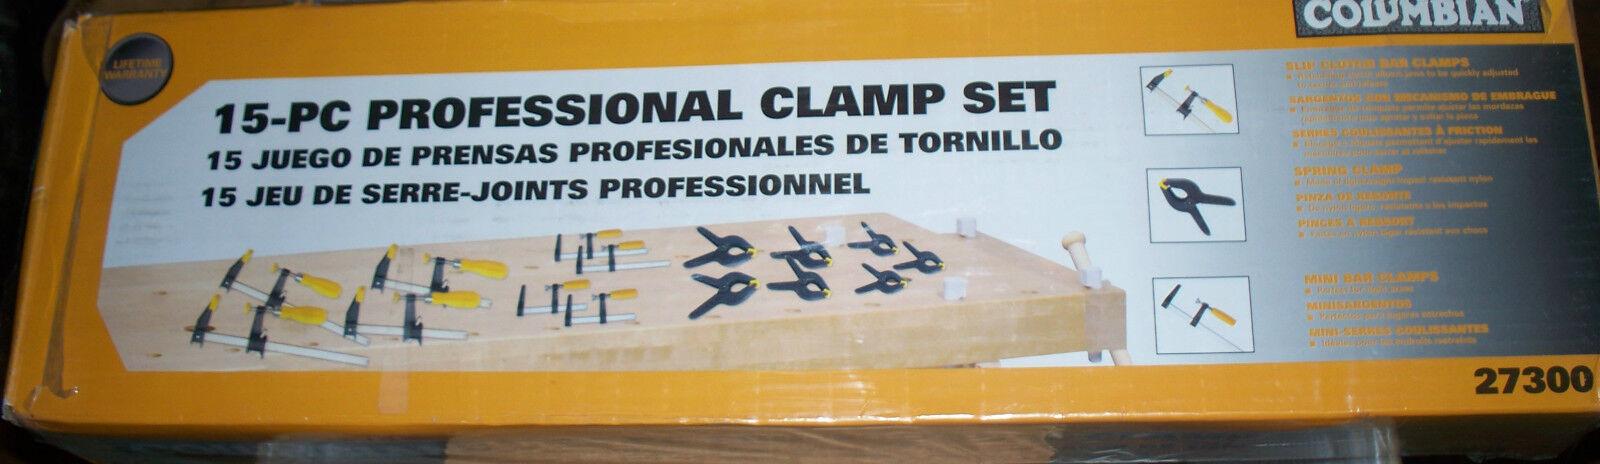 15 Piece PROFESSIONAL CLAMP SET - Columbian -  27300 - NEW